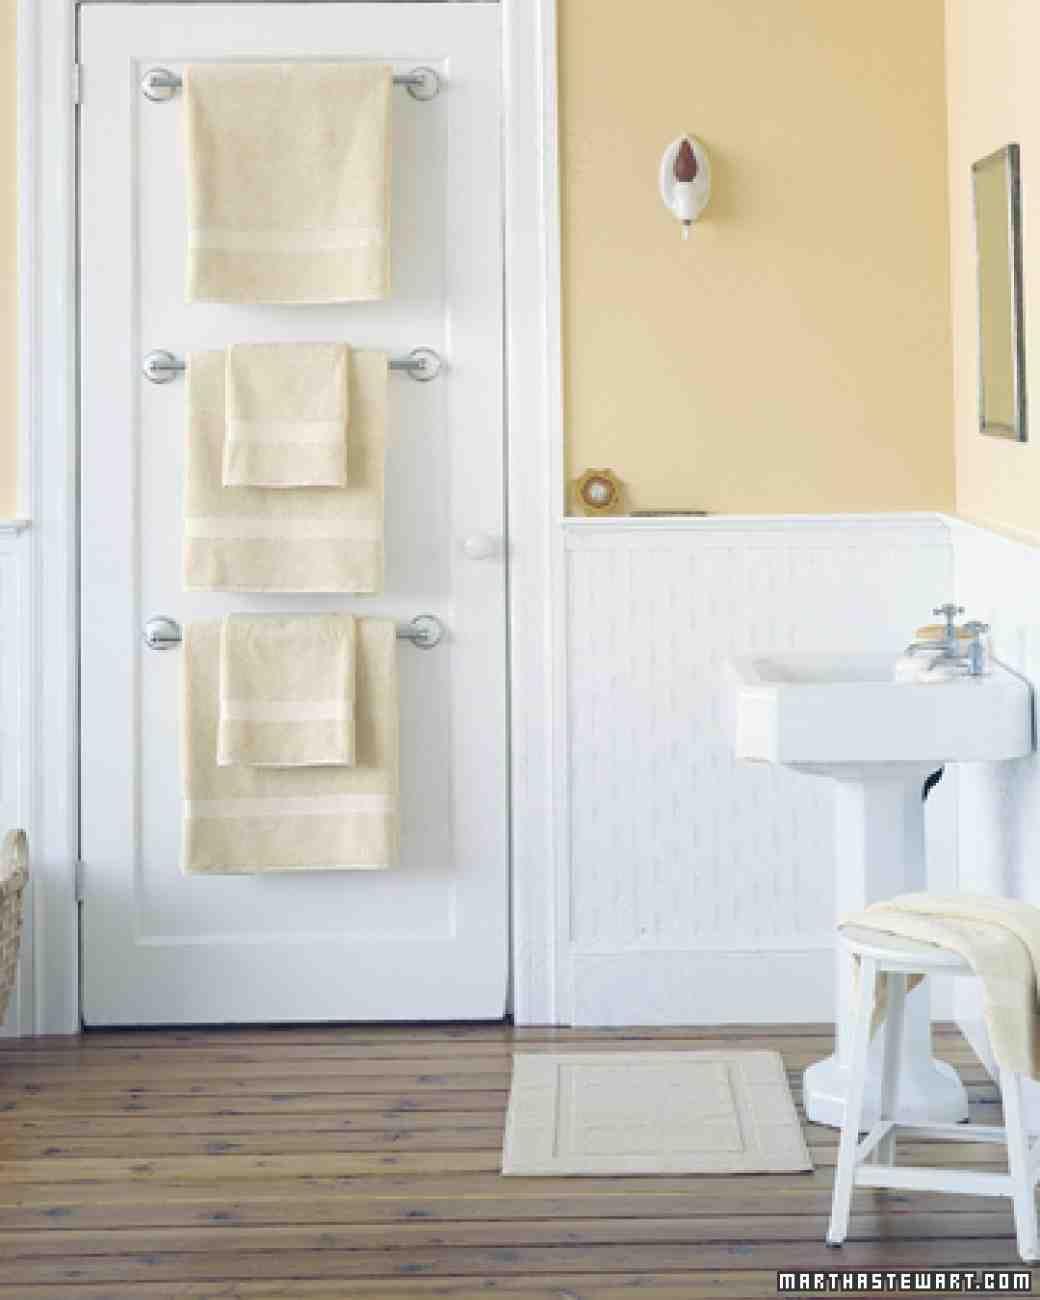 Towel Bar Trio Badevaerelsesideer Badevaerelsesindretning Badevaerelsesrenovering